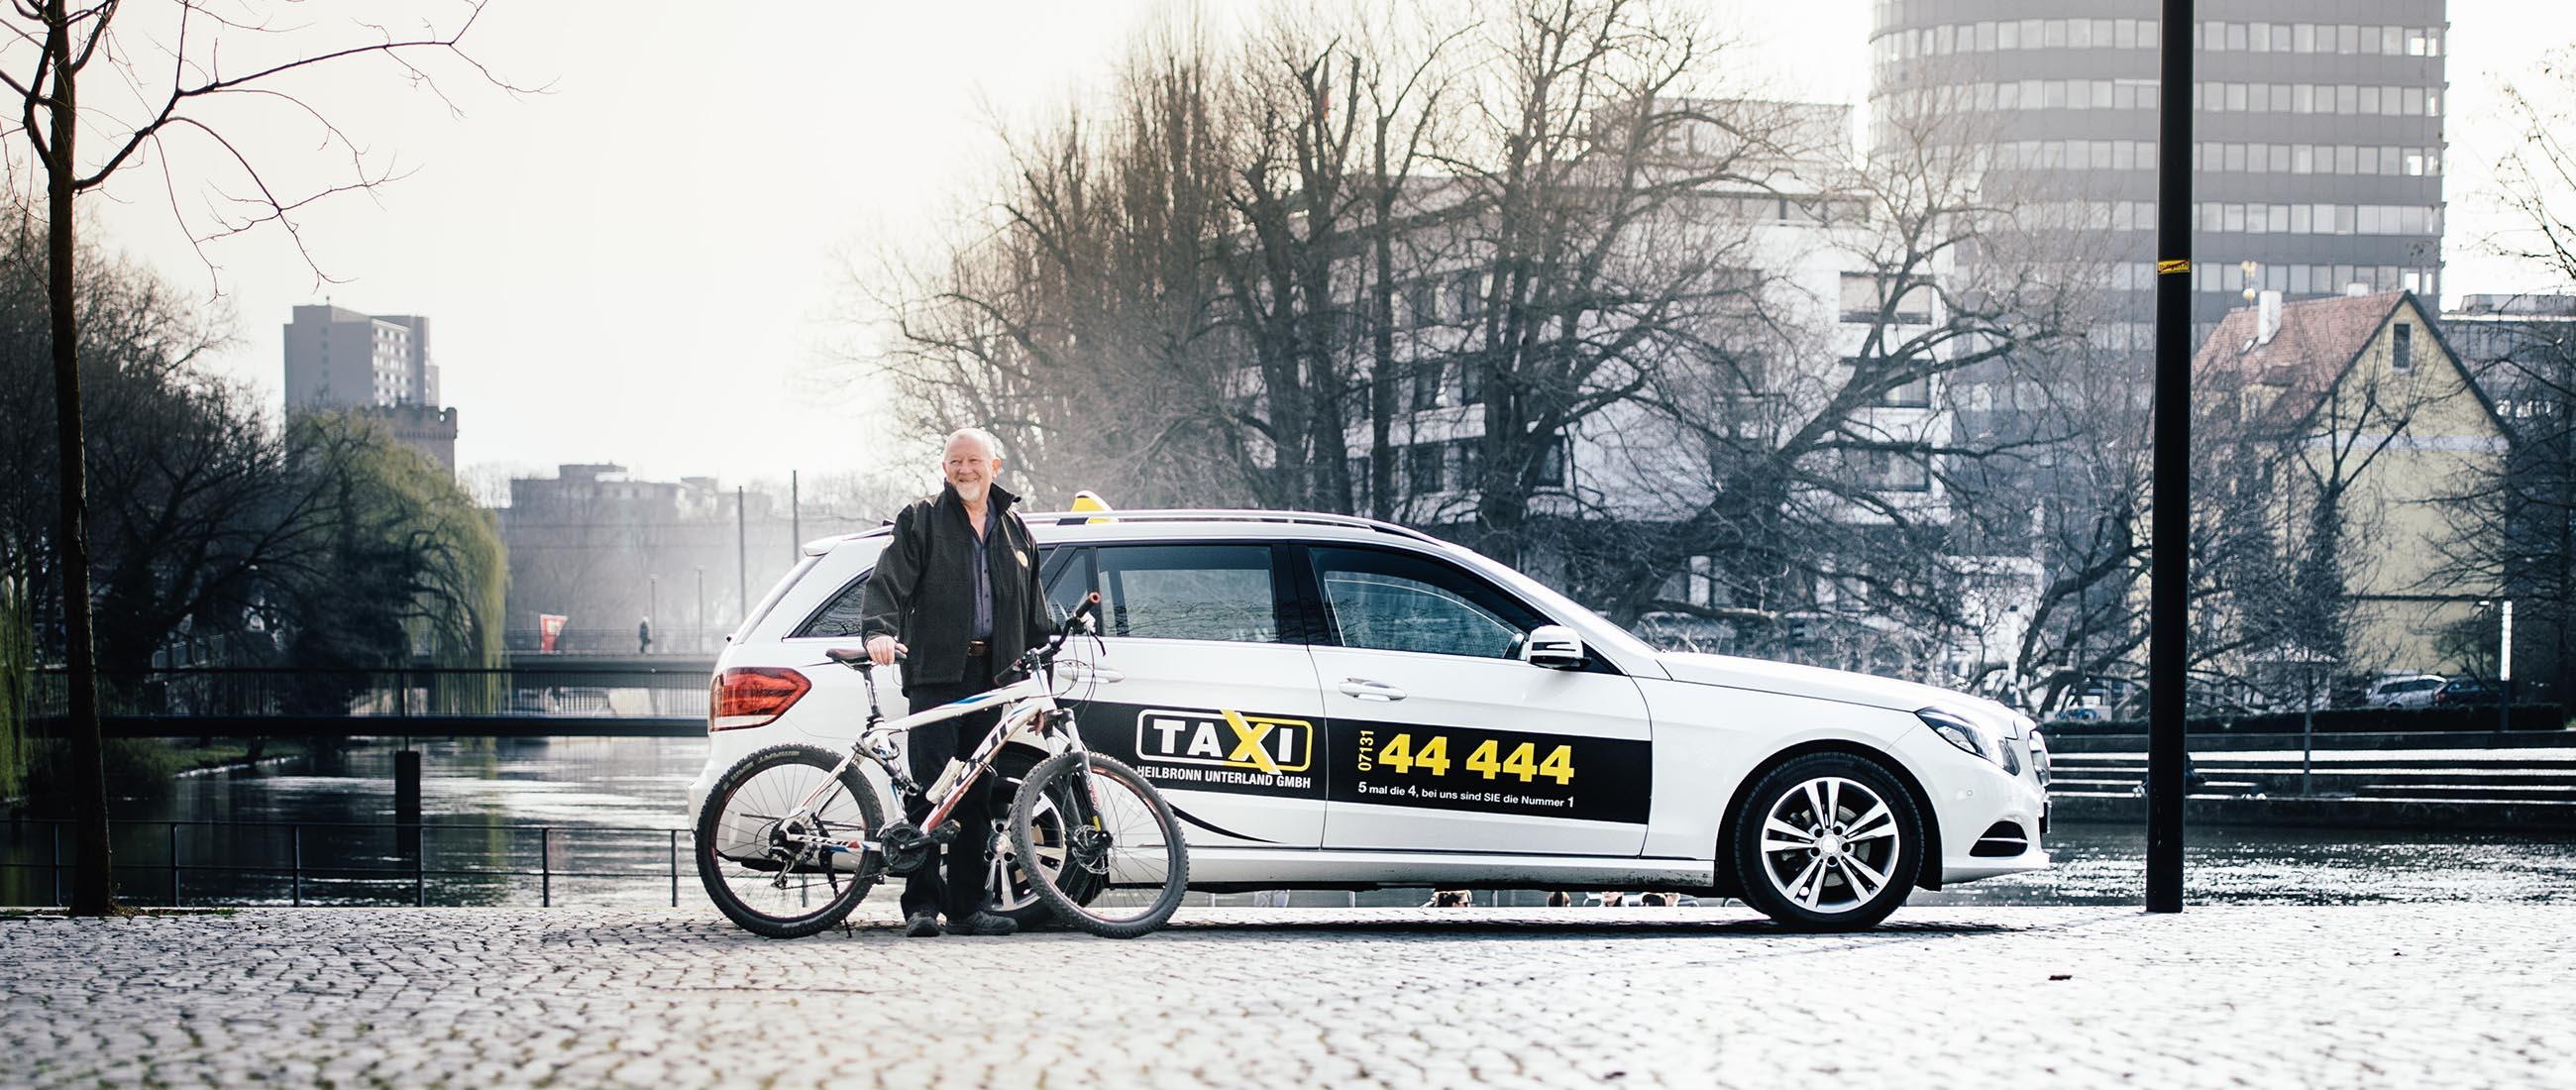 taxi-slider_0004_taxi-unterland-69